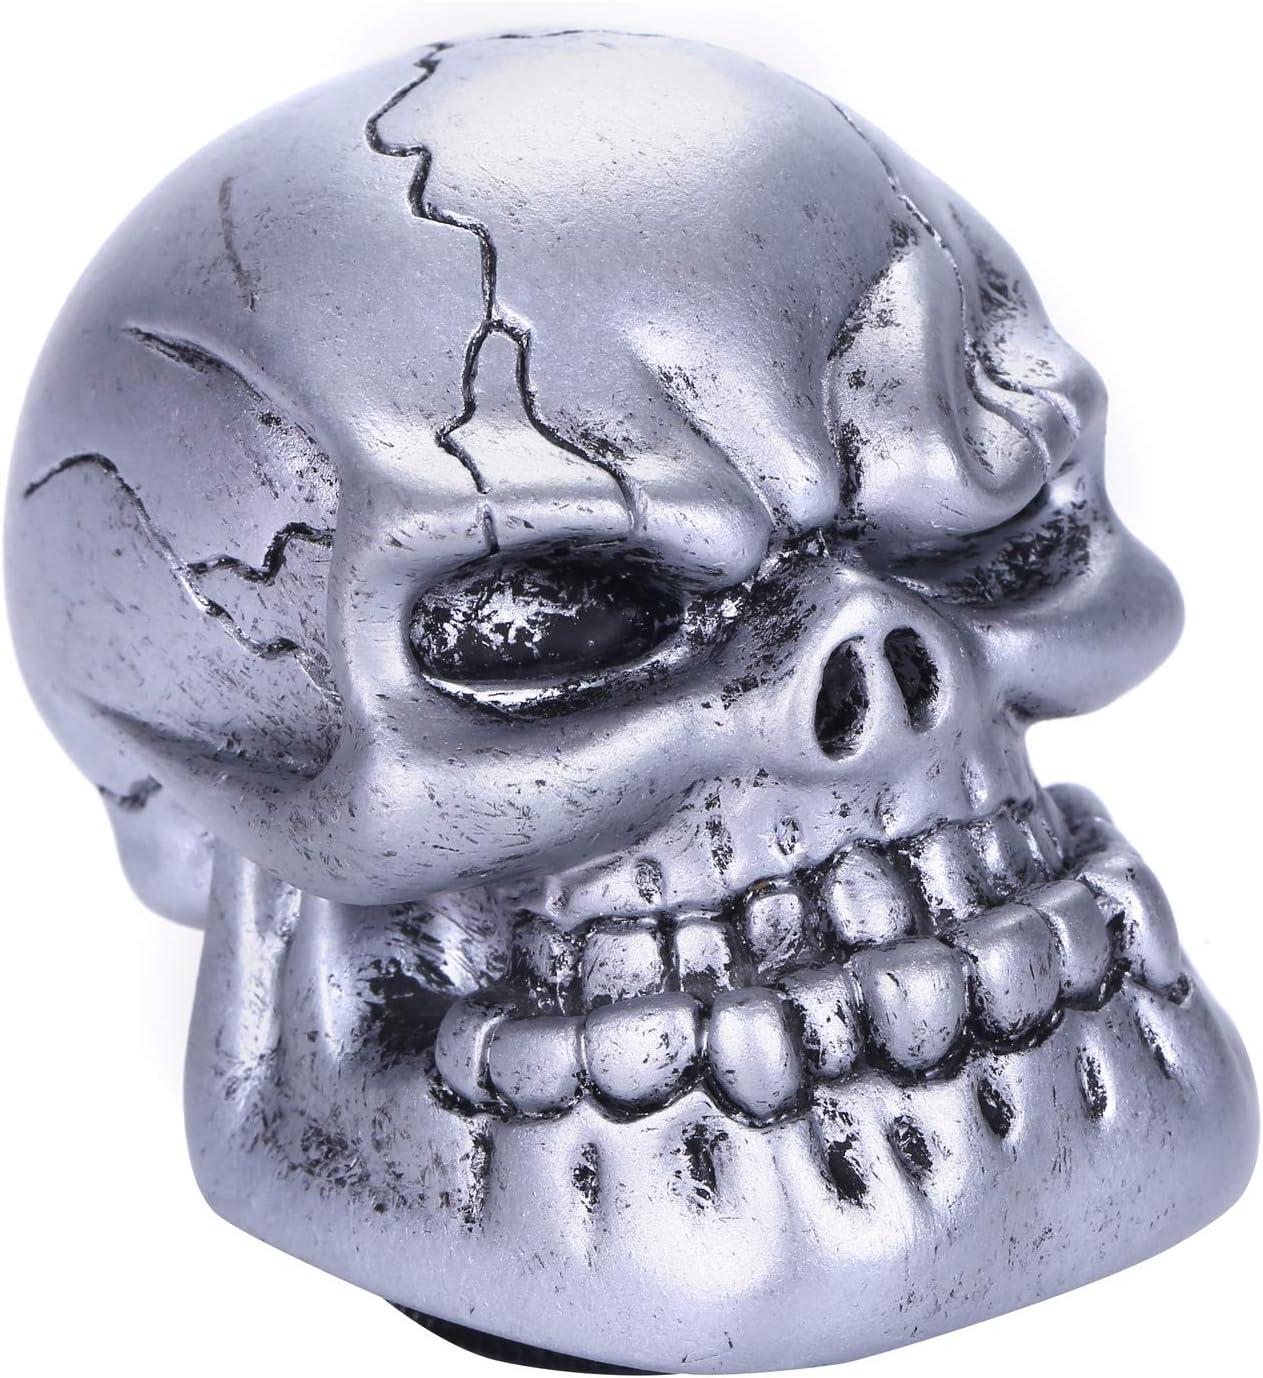 Metal Blue Bashineng Gear Stick Knob Skull Style Shift Head Universal Shifter Fit Most Manual Automatic Cars